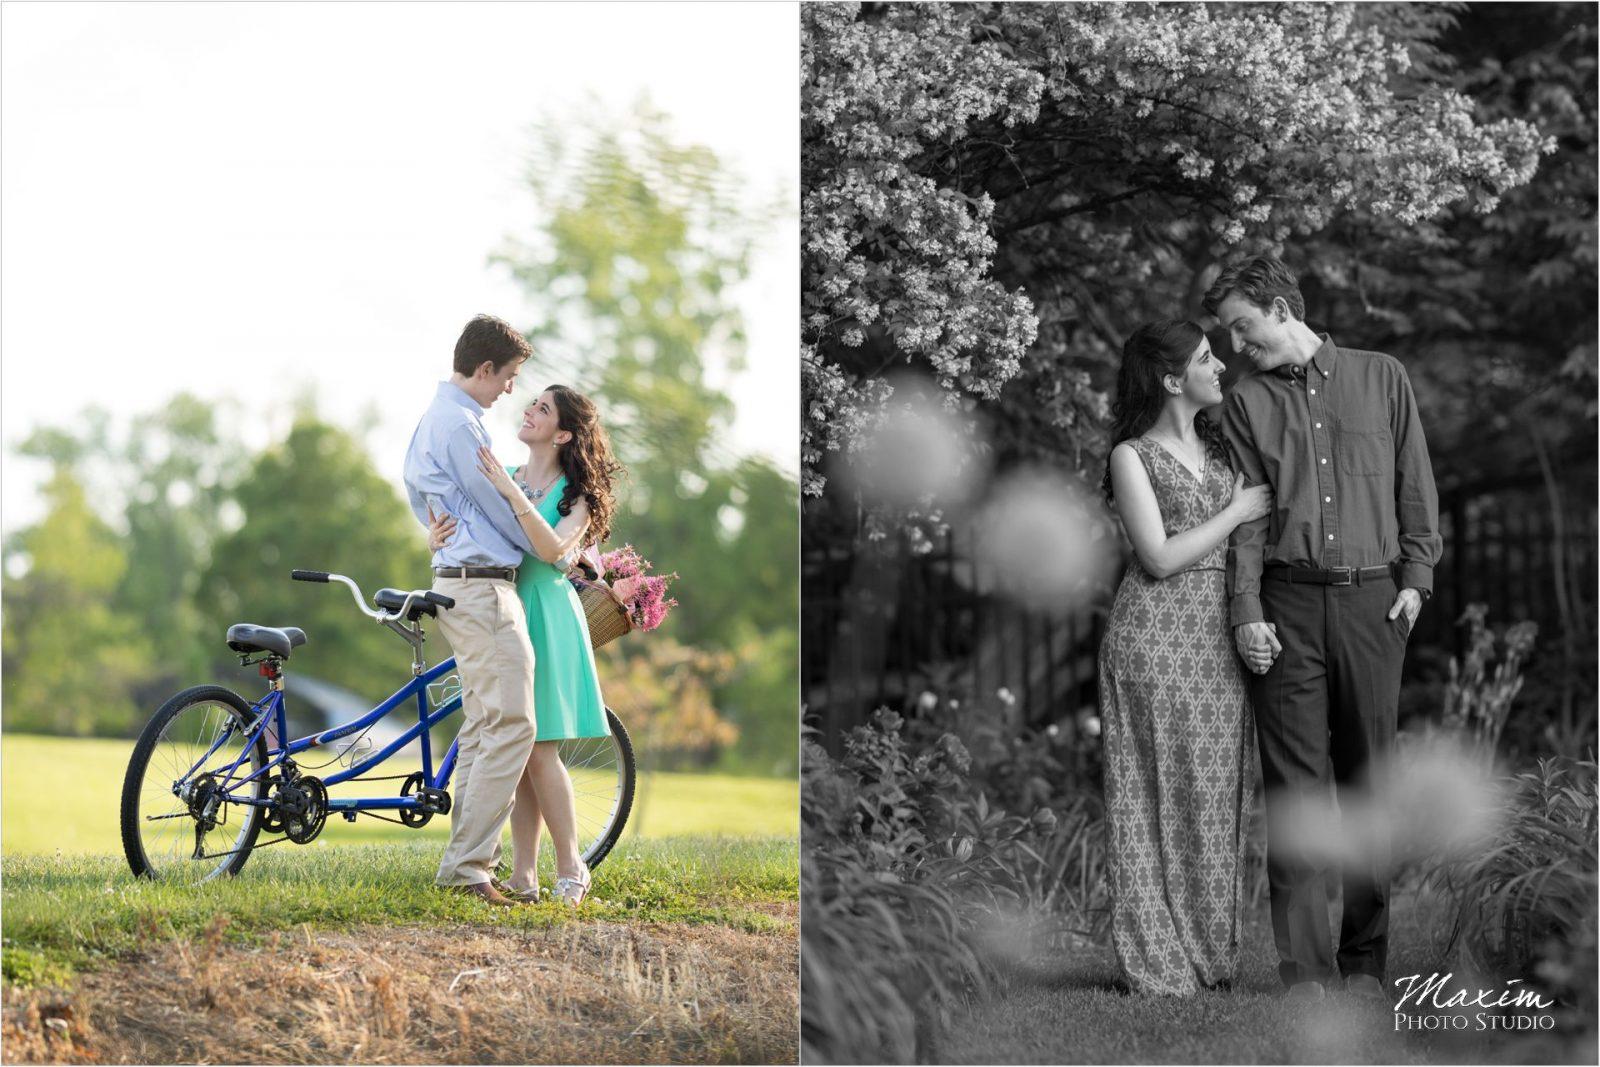 Smith Gardens Cox Arboretum Dayton Ohio engagement tandem bike